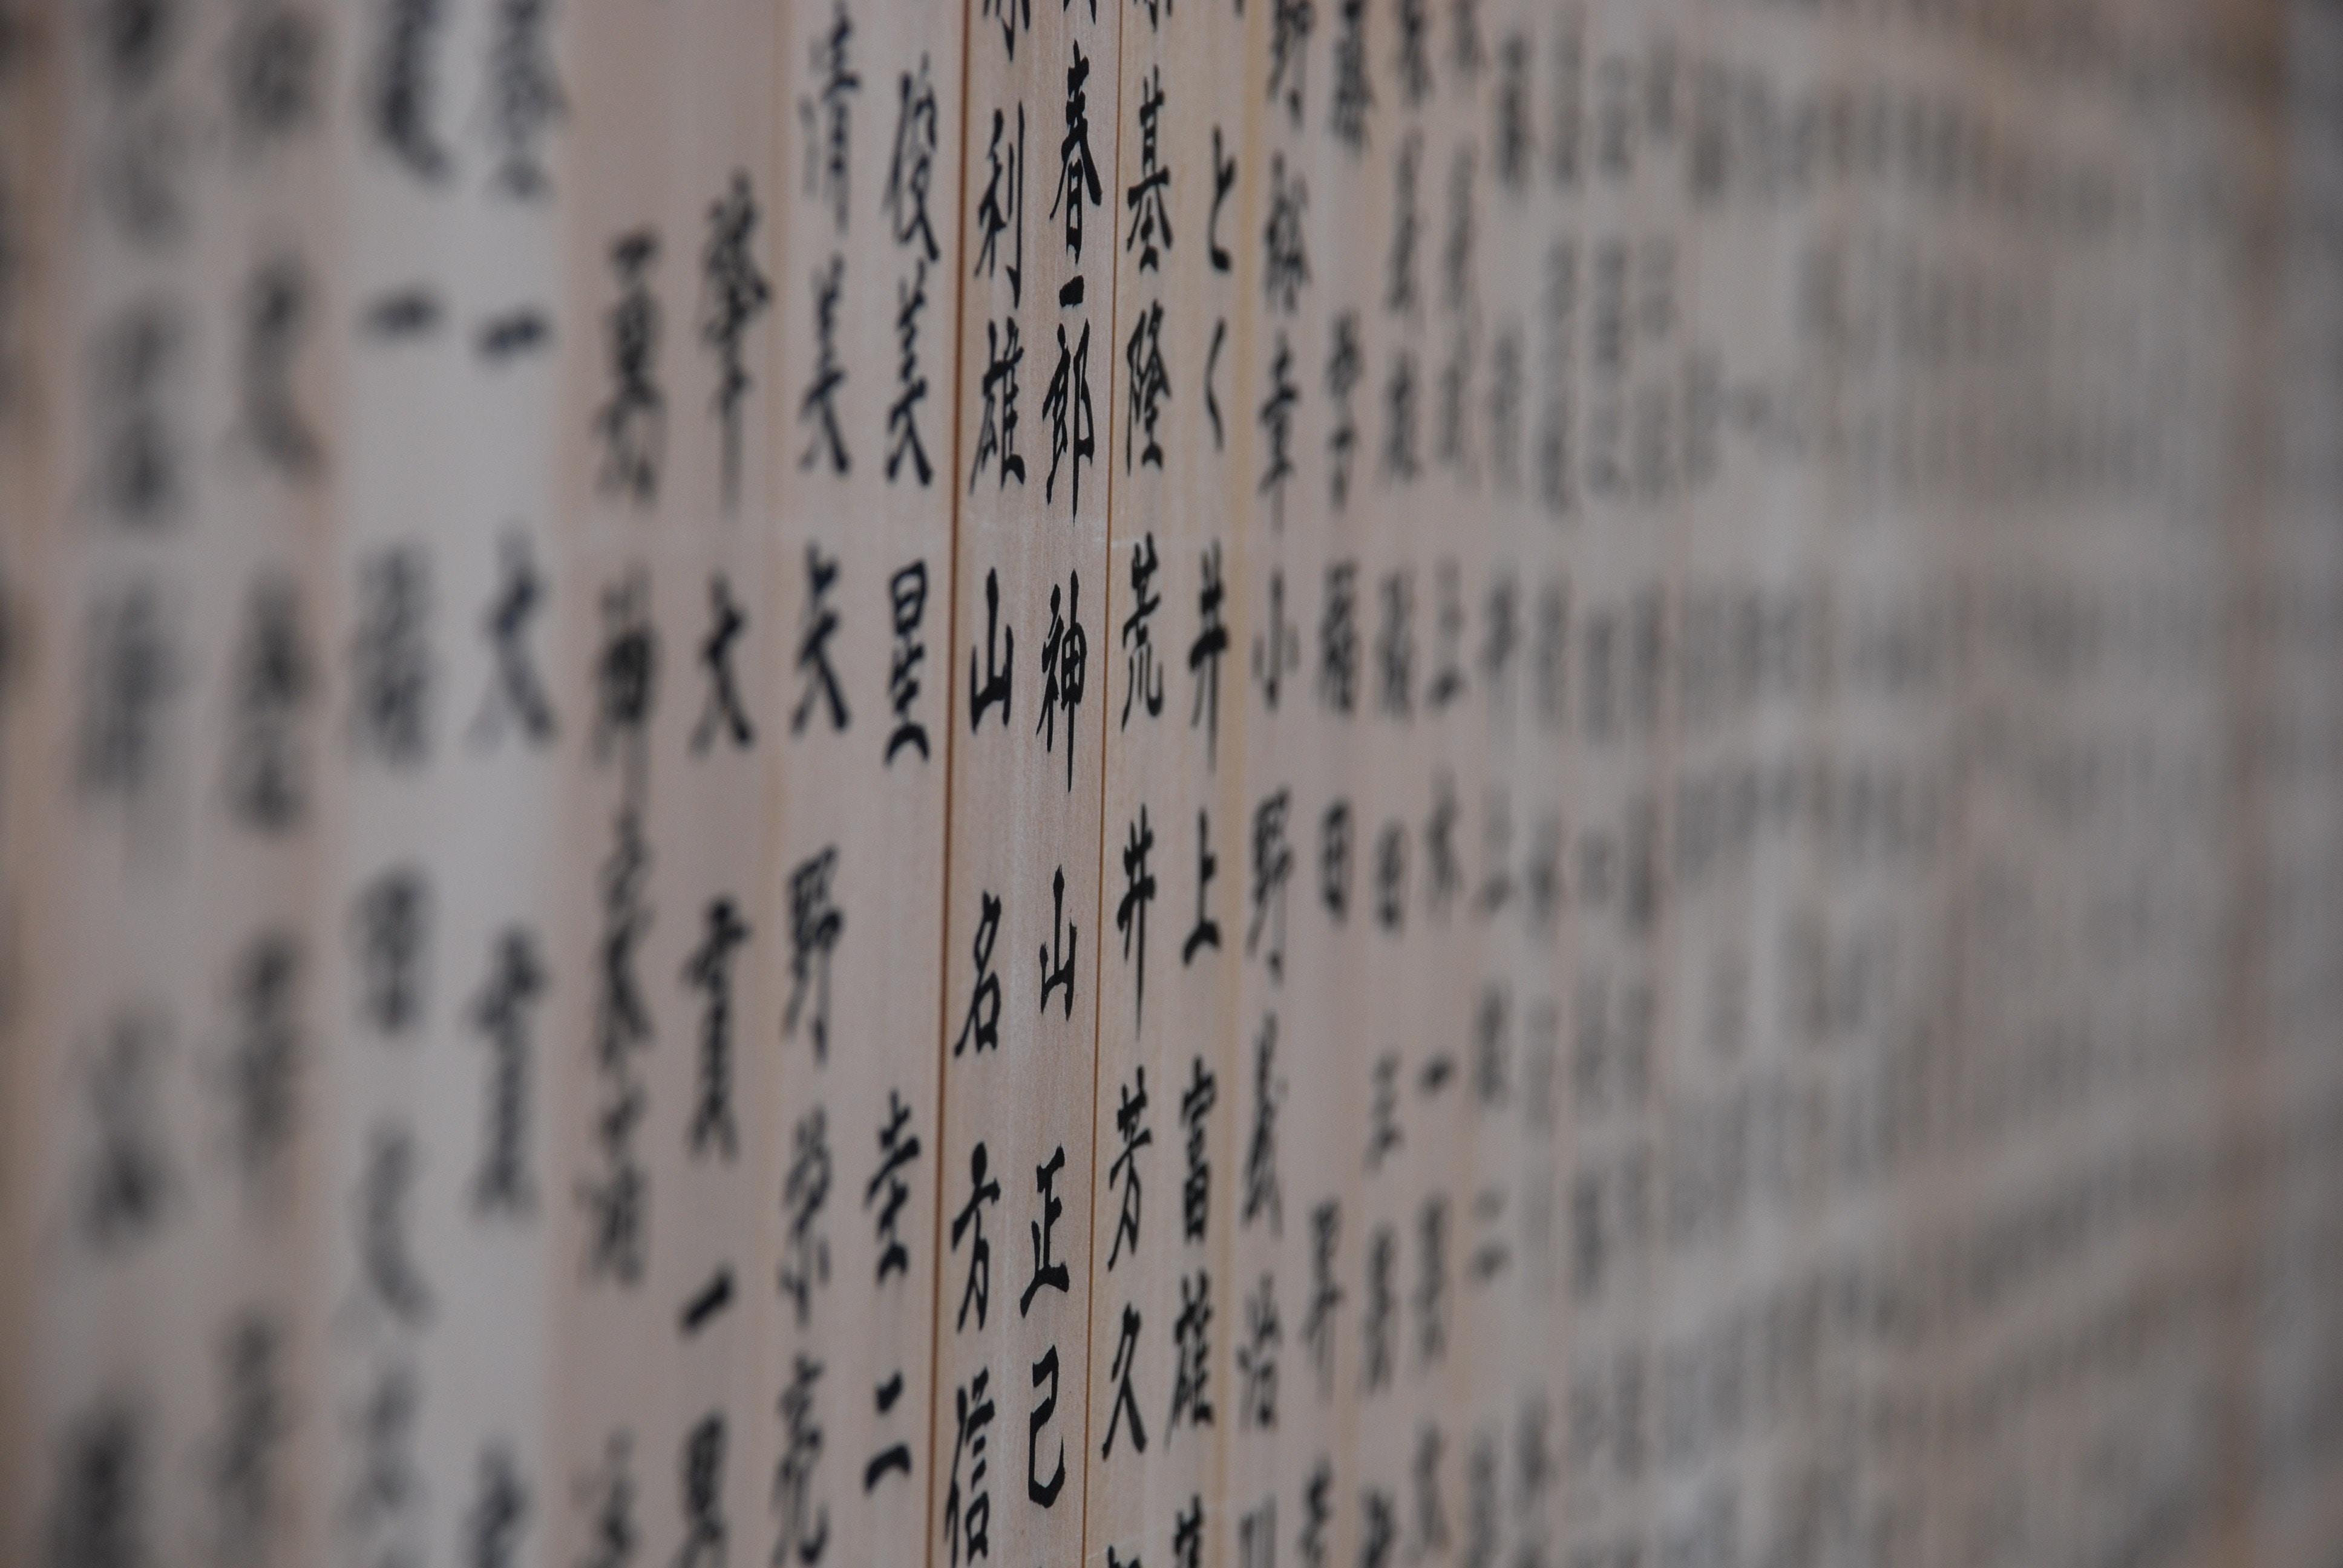 black kanji text